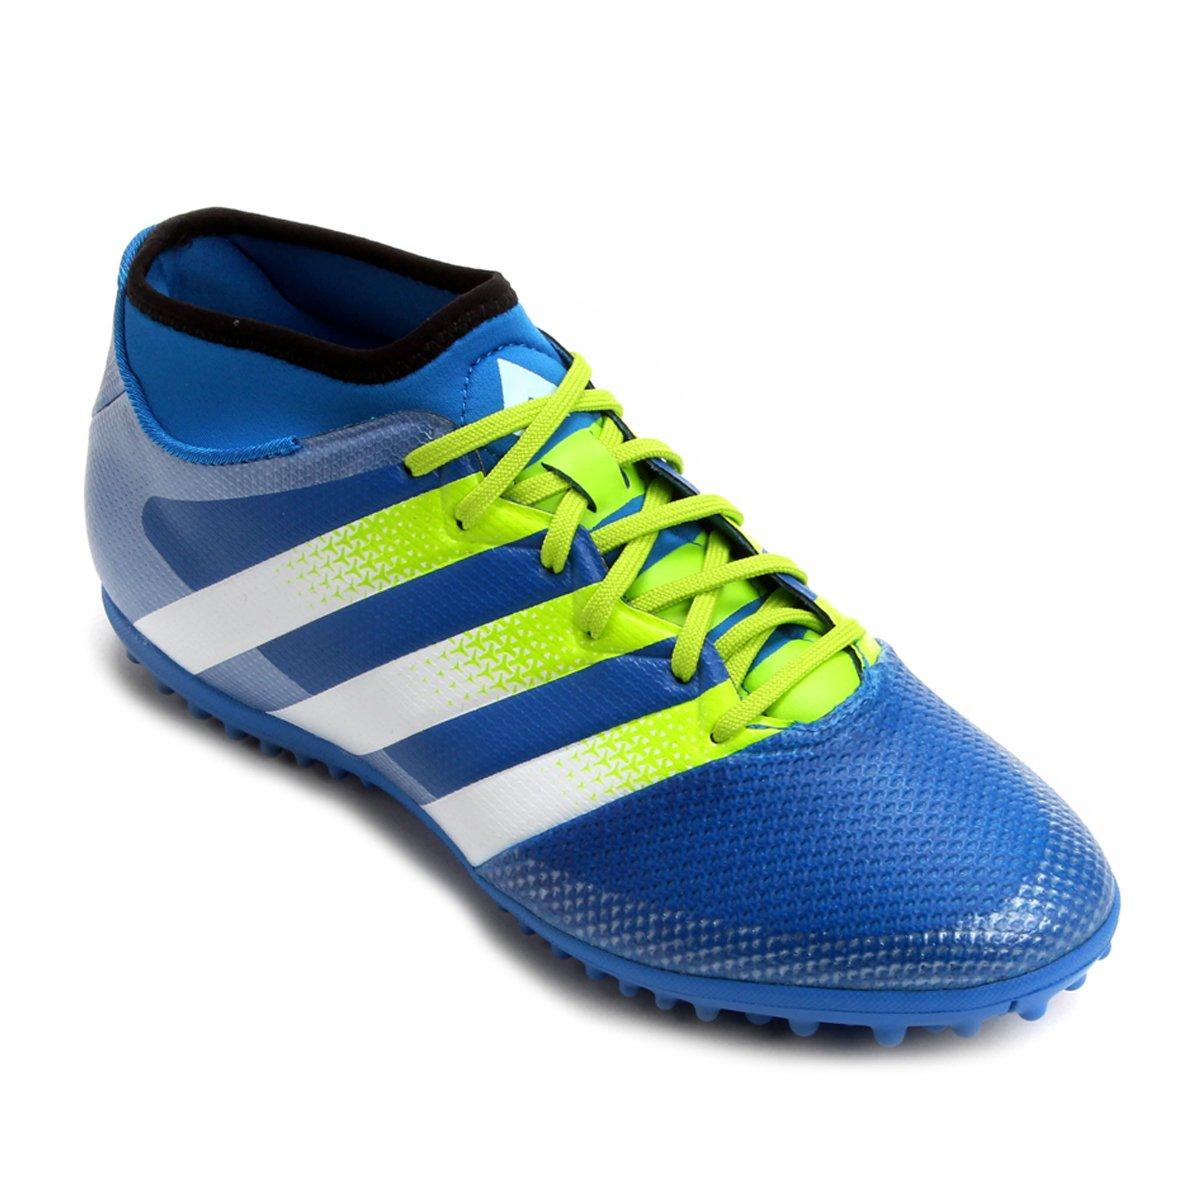 Chuteira Society Adidas Ace 16.3 Primemesh TF Masculina - Compre ... db292a528e0e8